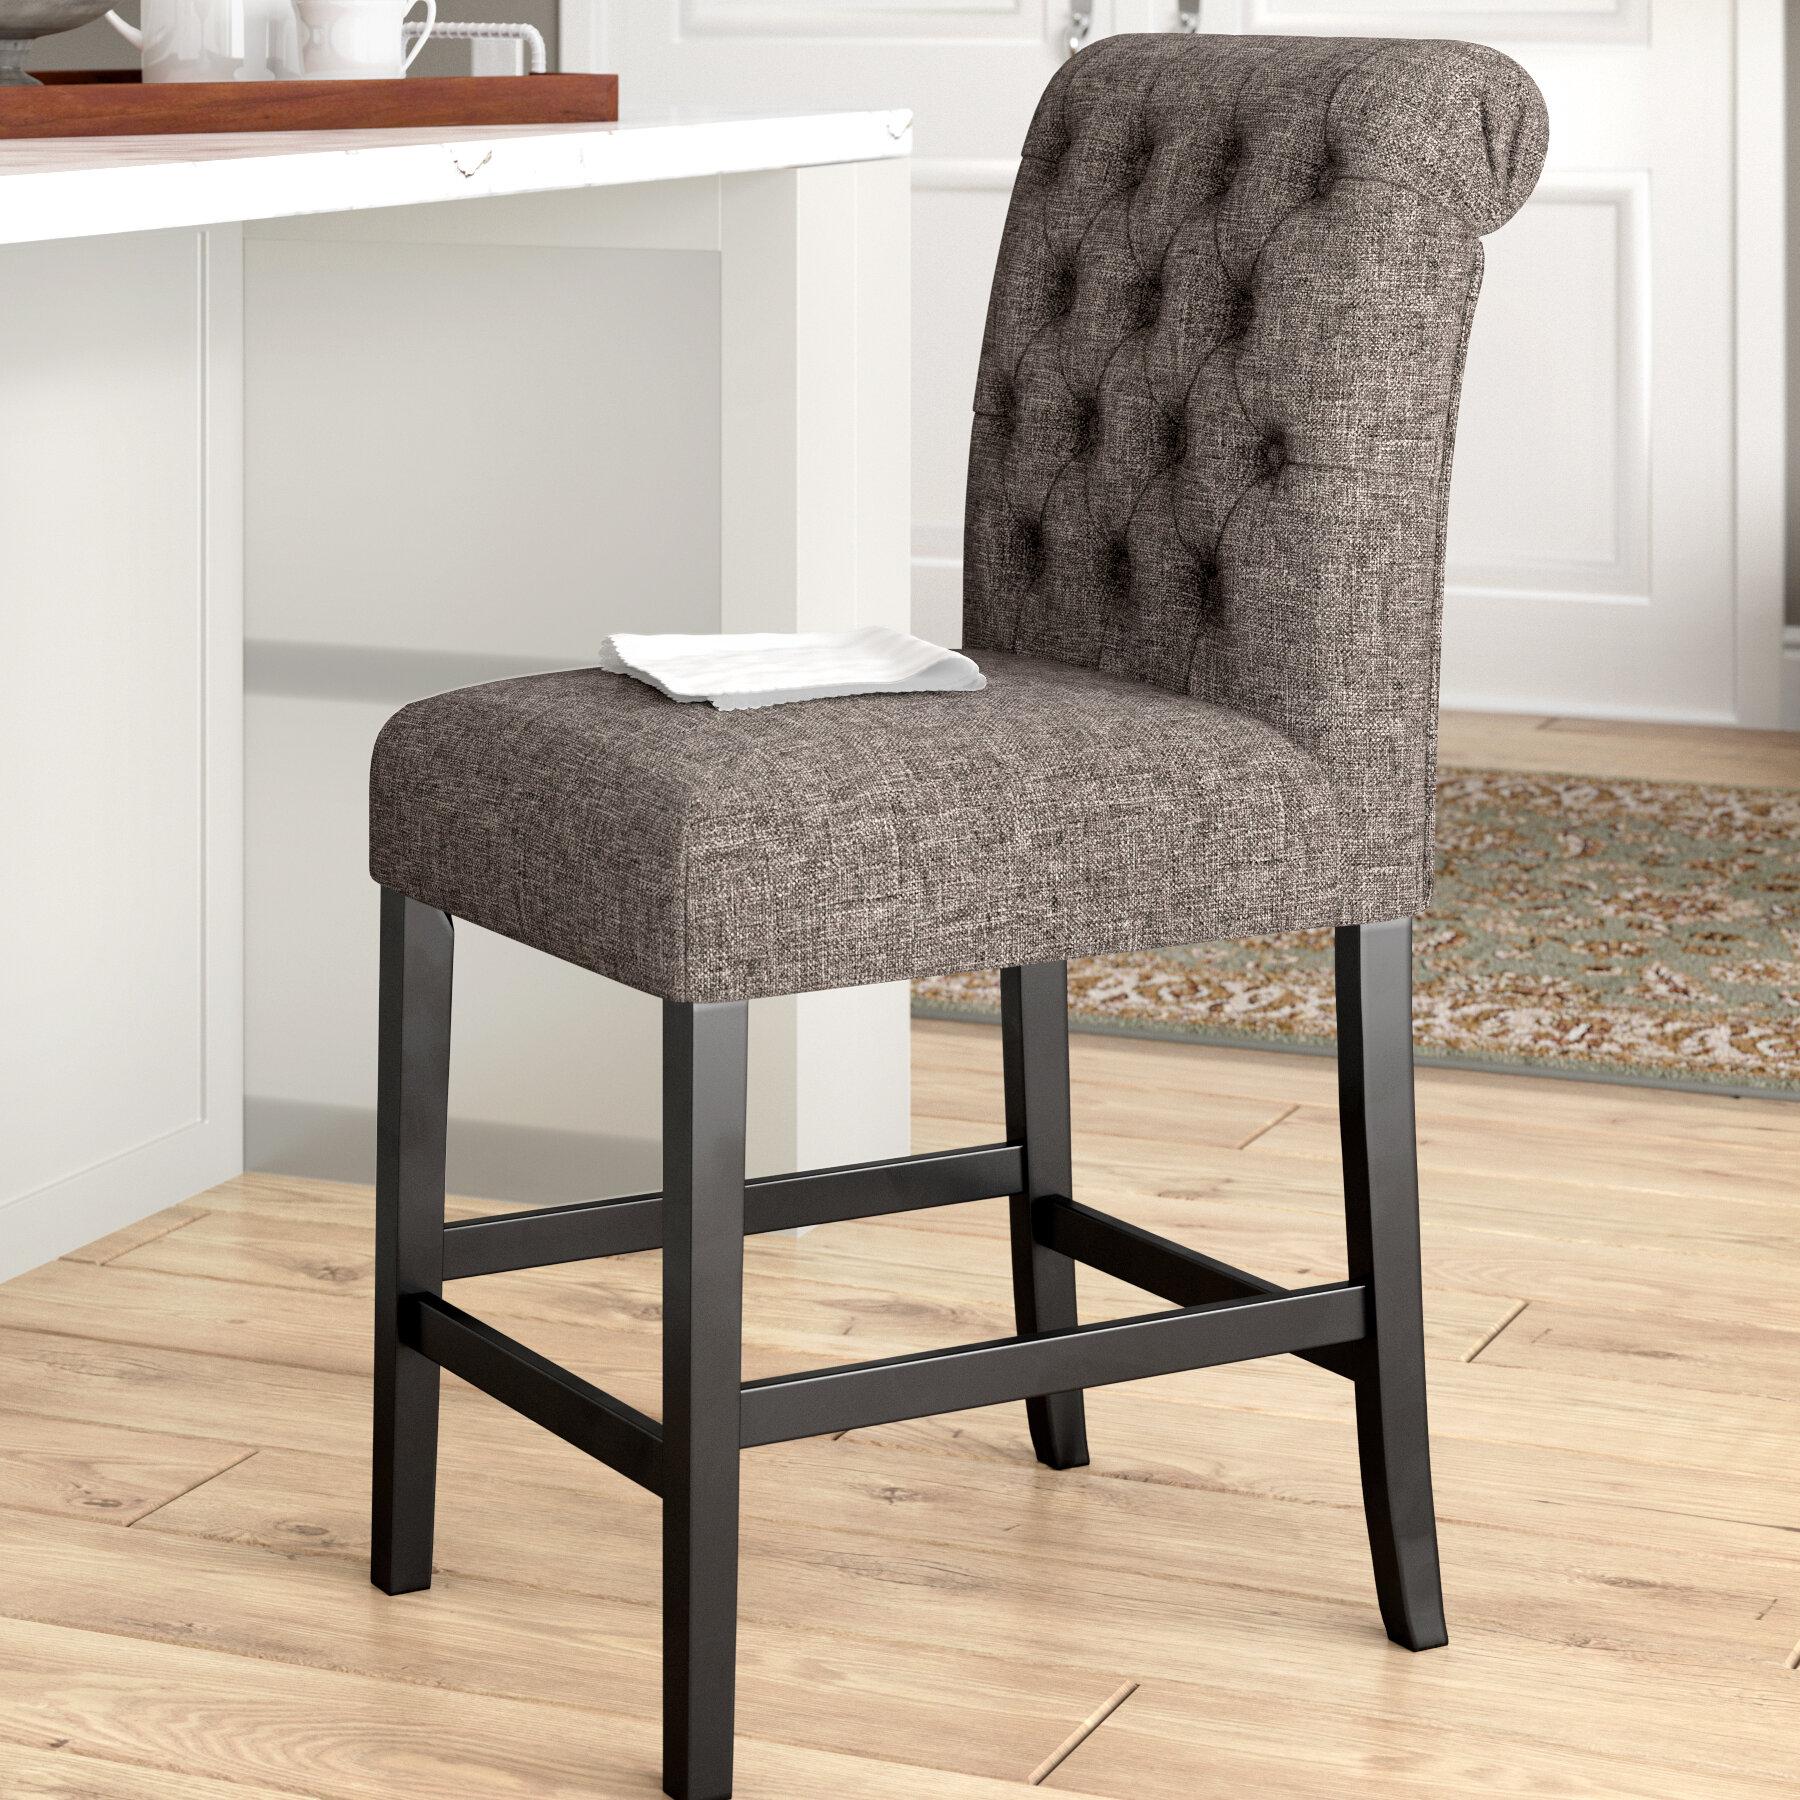 Darby home co urbana upholstered bar stool reviews wayfair